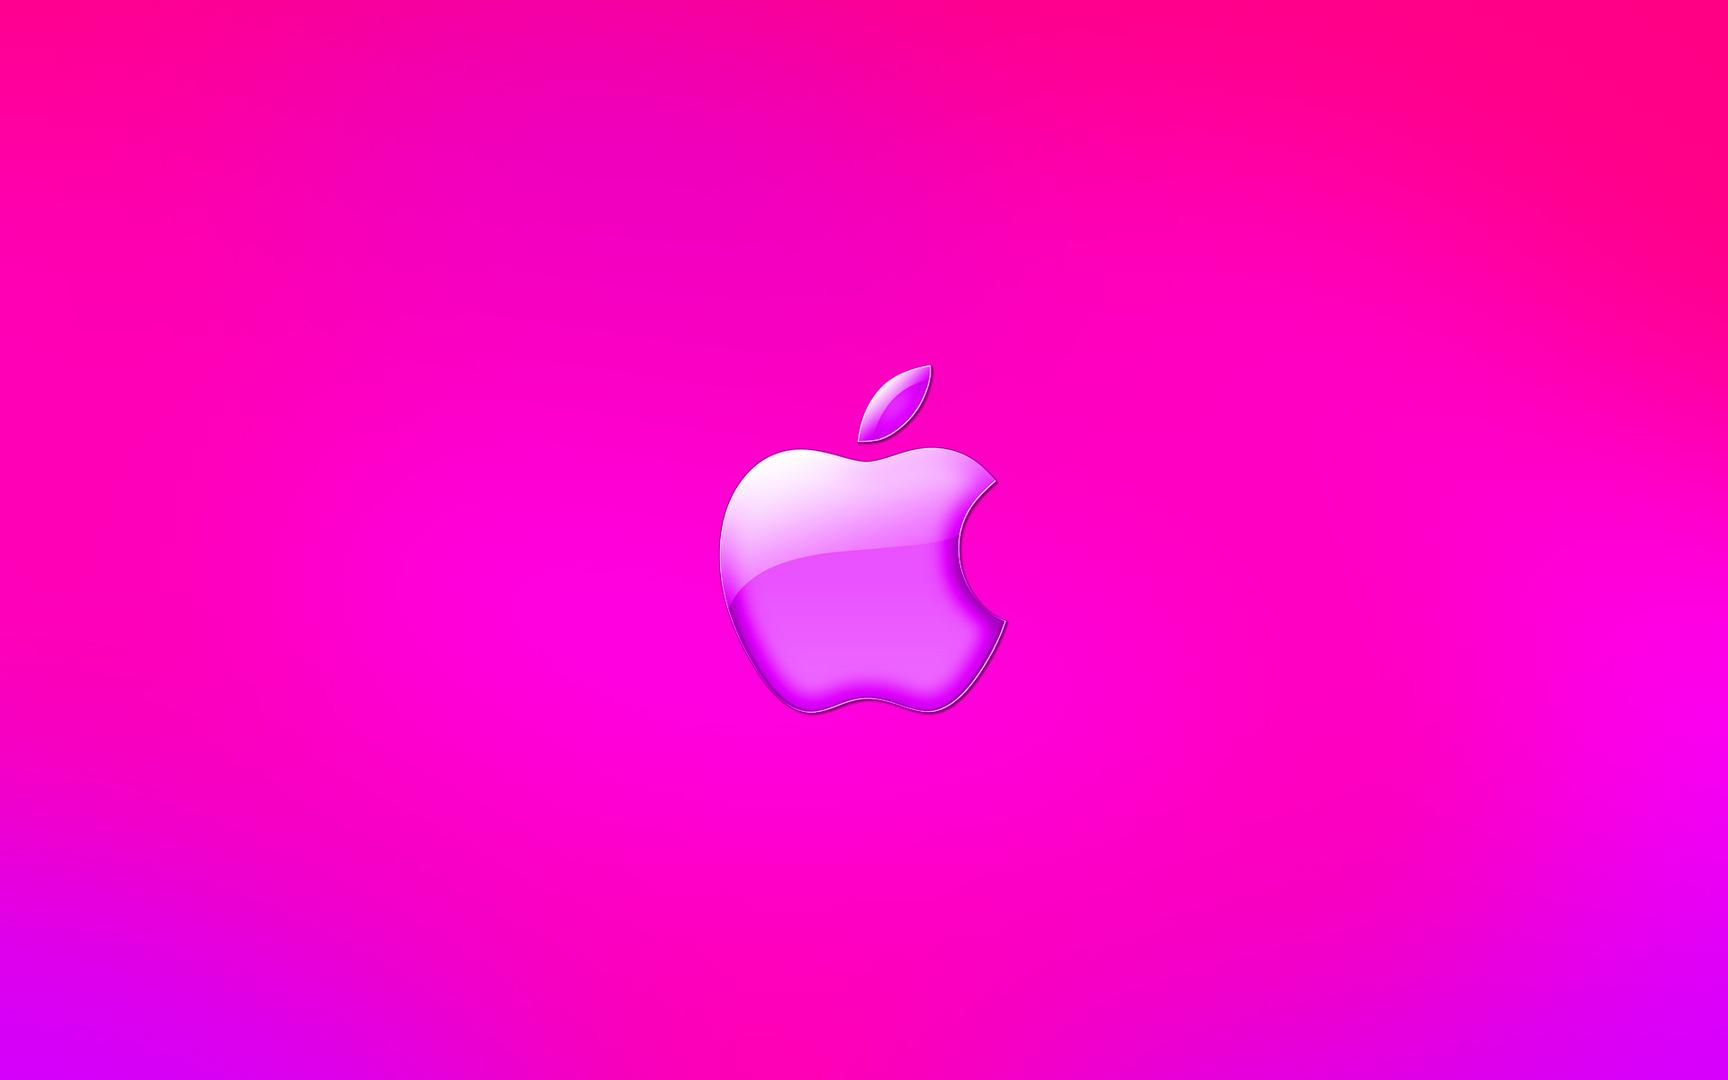 hot pink apple wallpaper hot pink apple 1728x1080